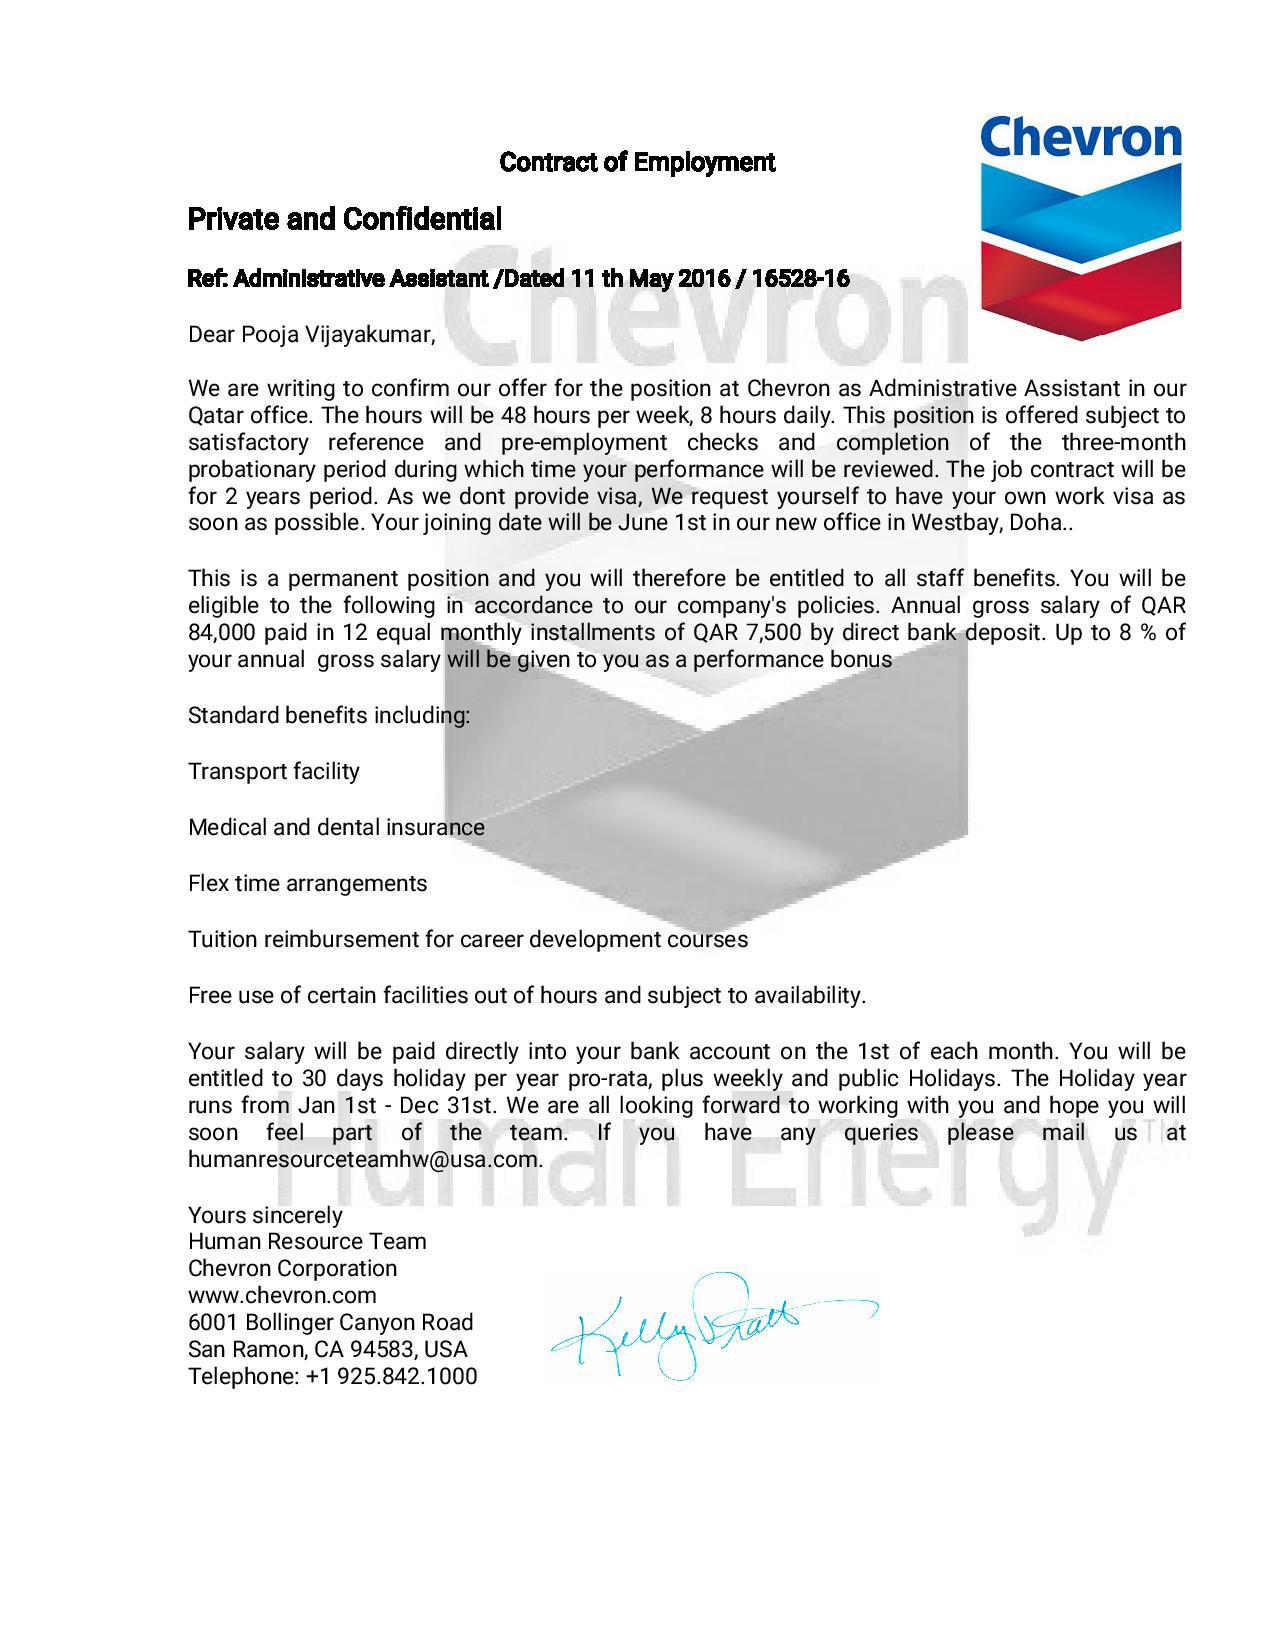 False offer letter qatar living false offer letterg altavistaventures Gallery